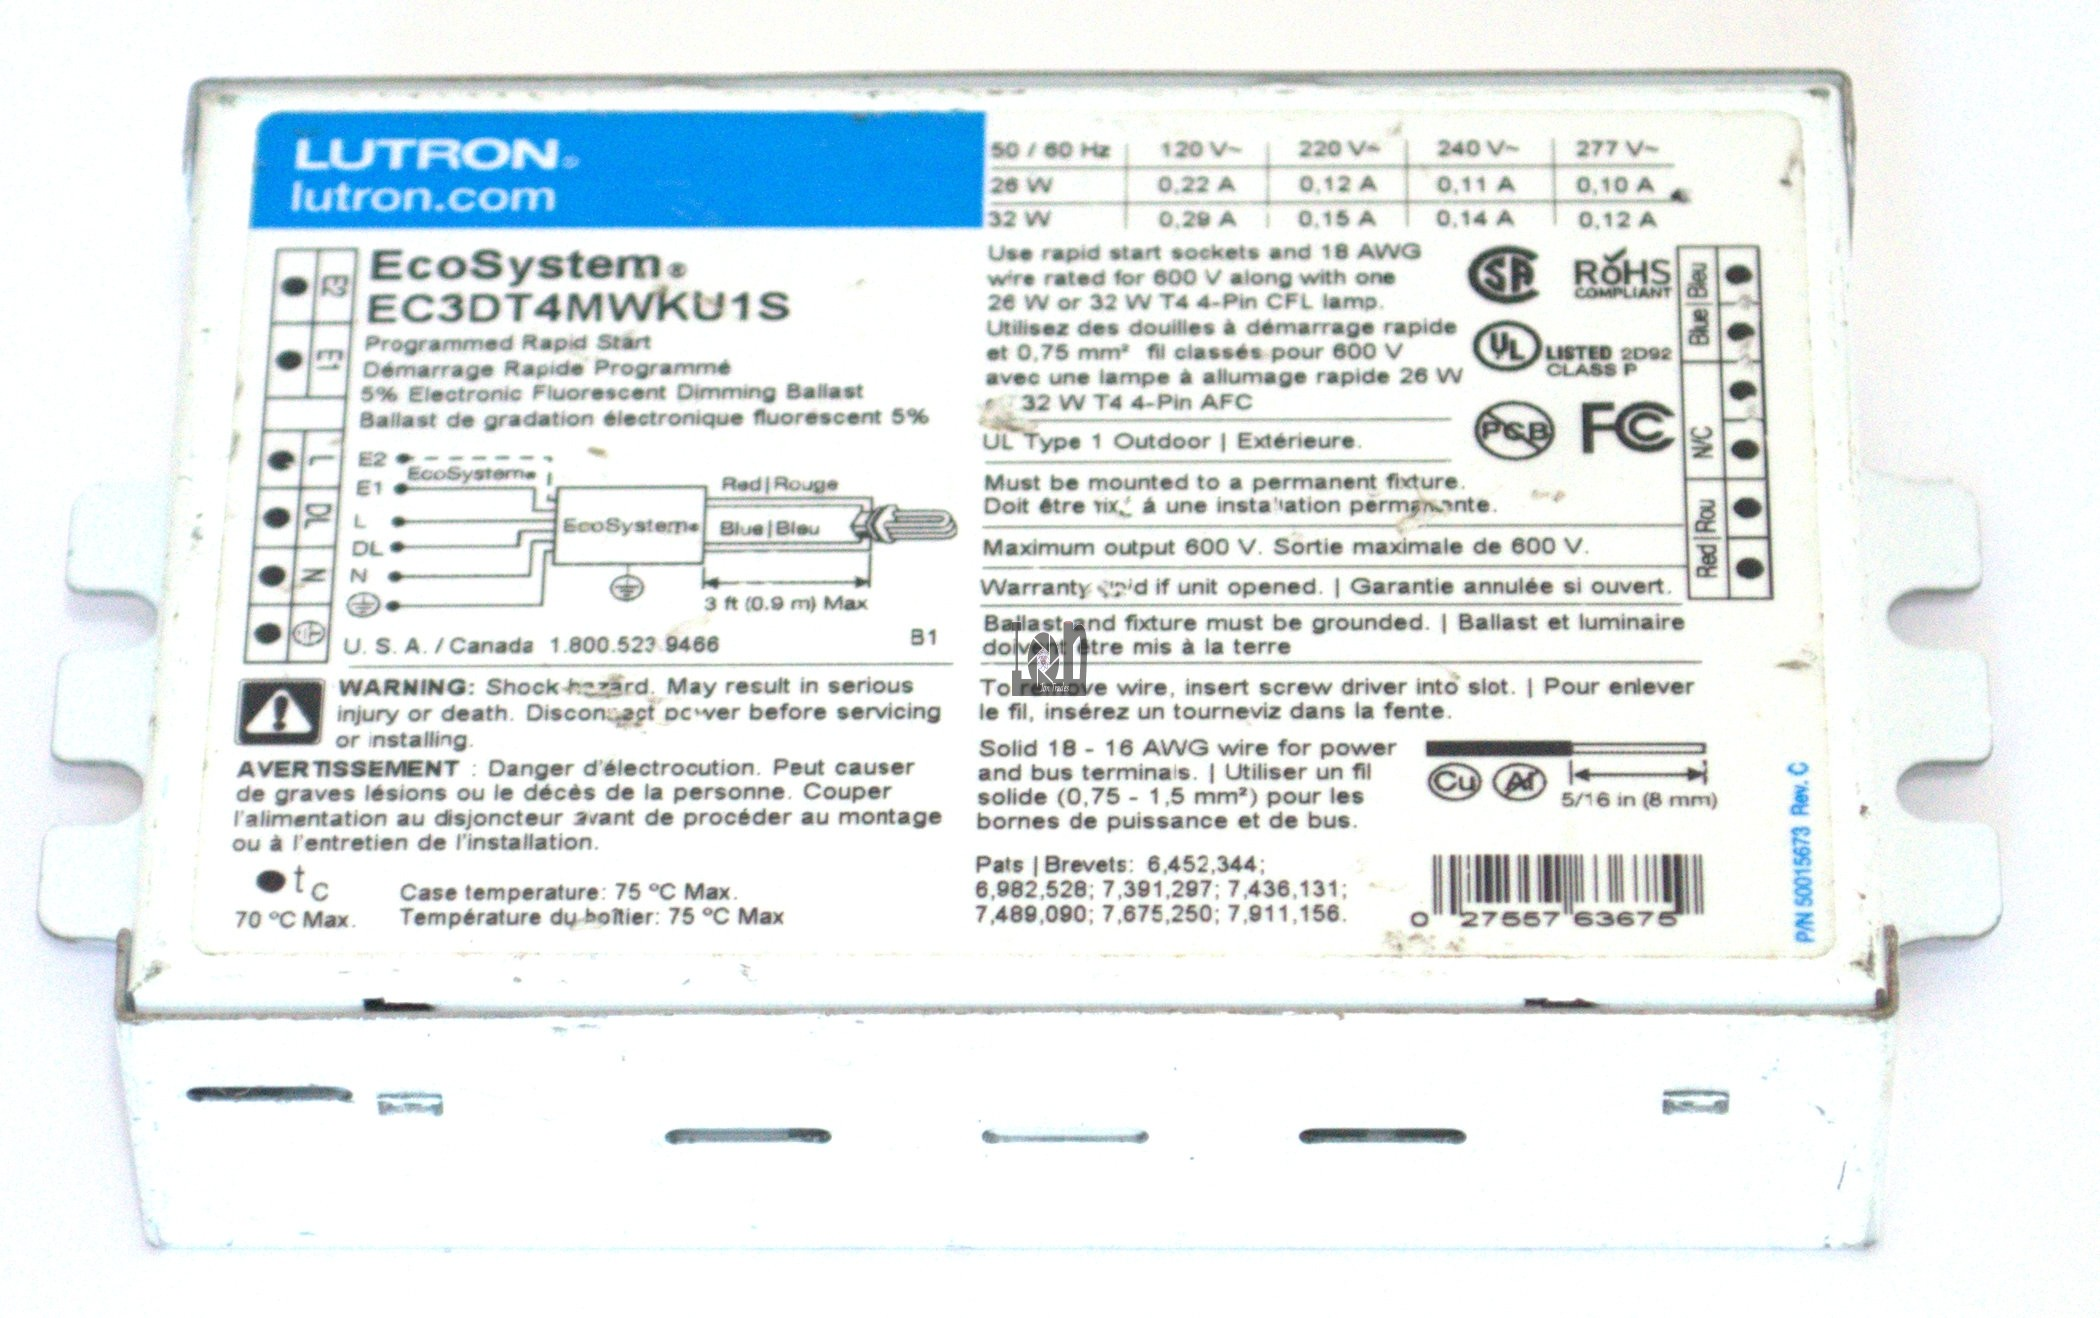 Lutron EC3DT4MWKU1S EcoSystem 5% Electronic Fluorescent Dimming Ballast